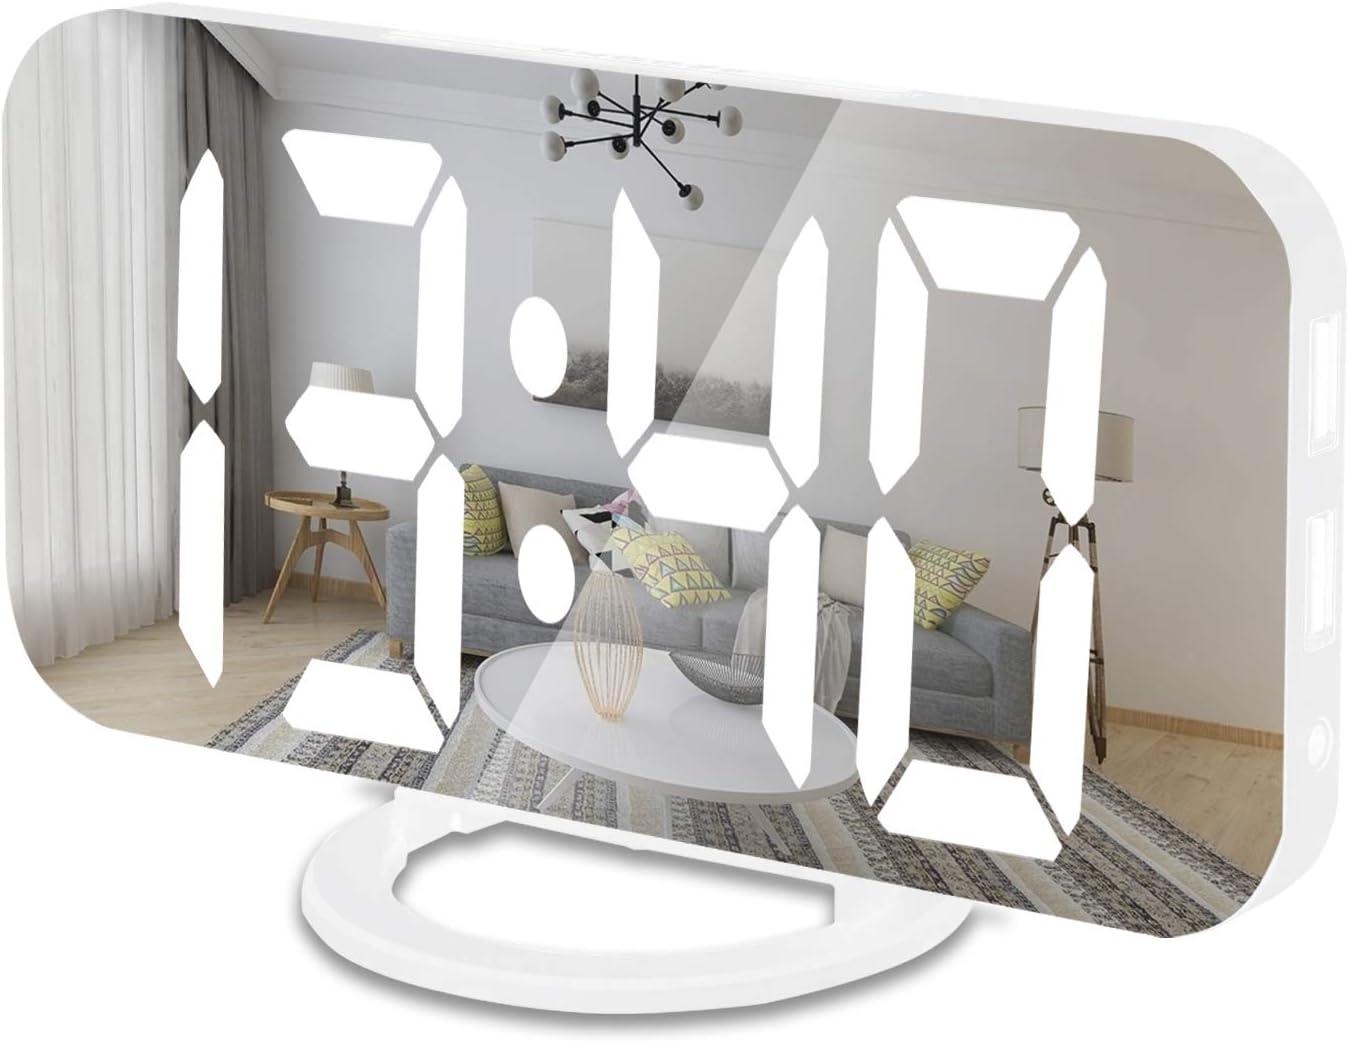 Digital Alarm Clock 6.6